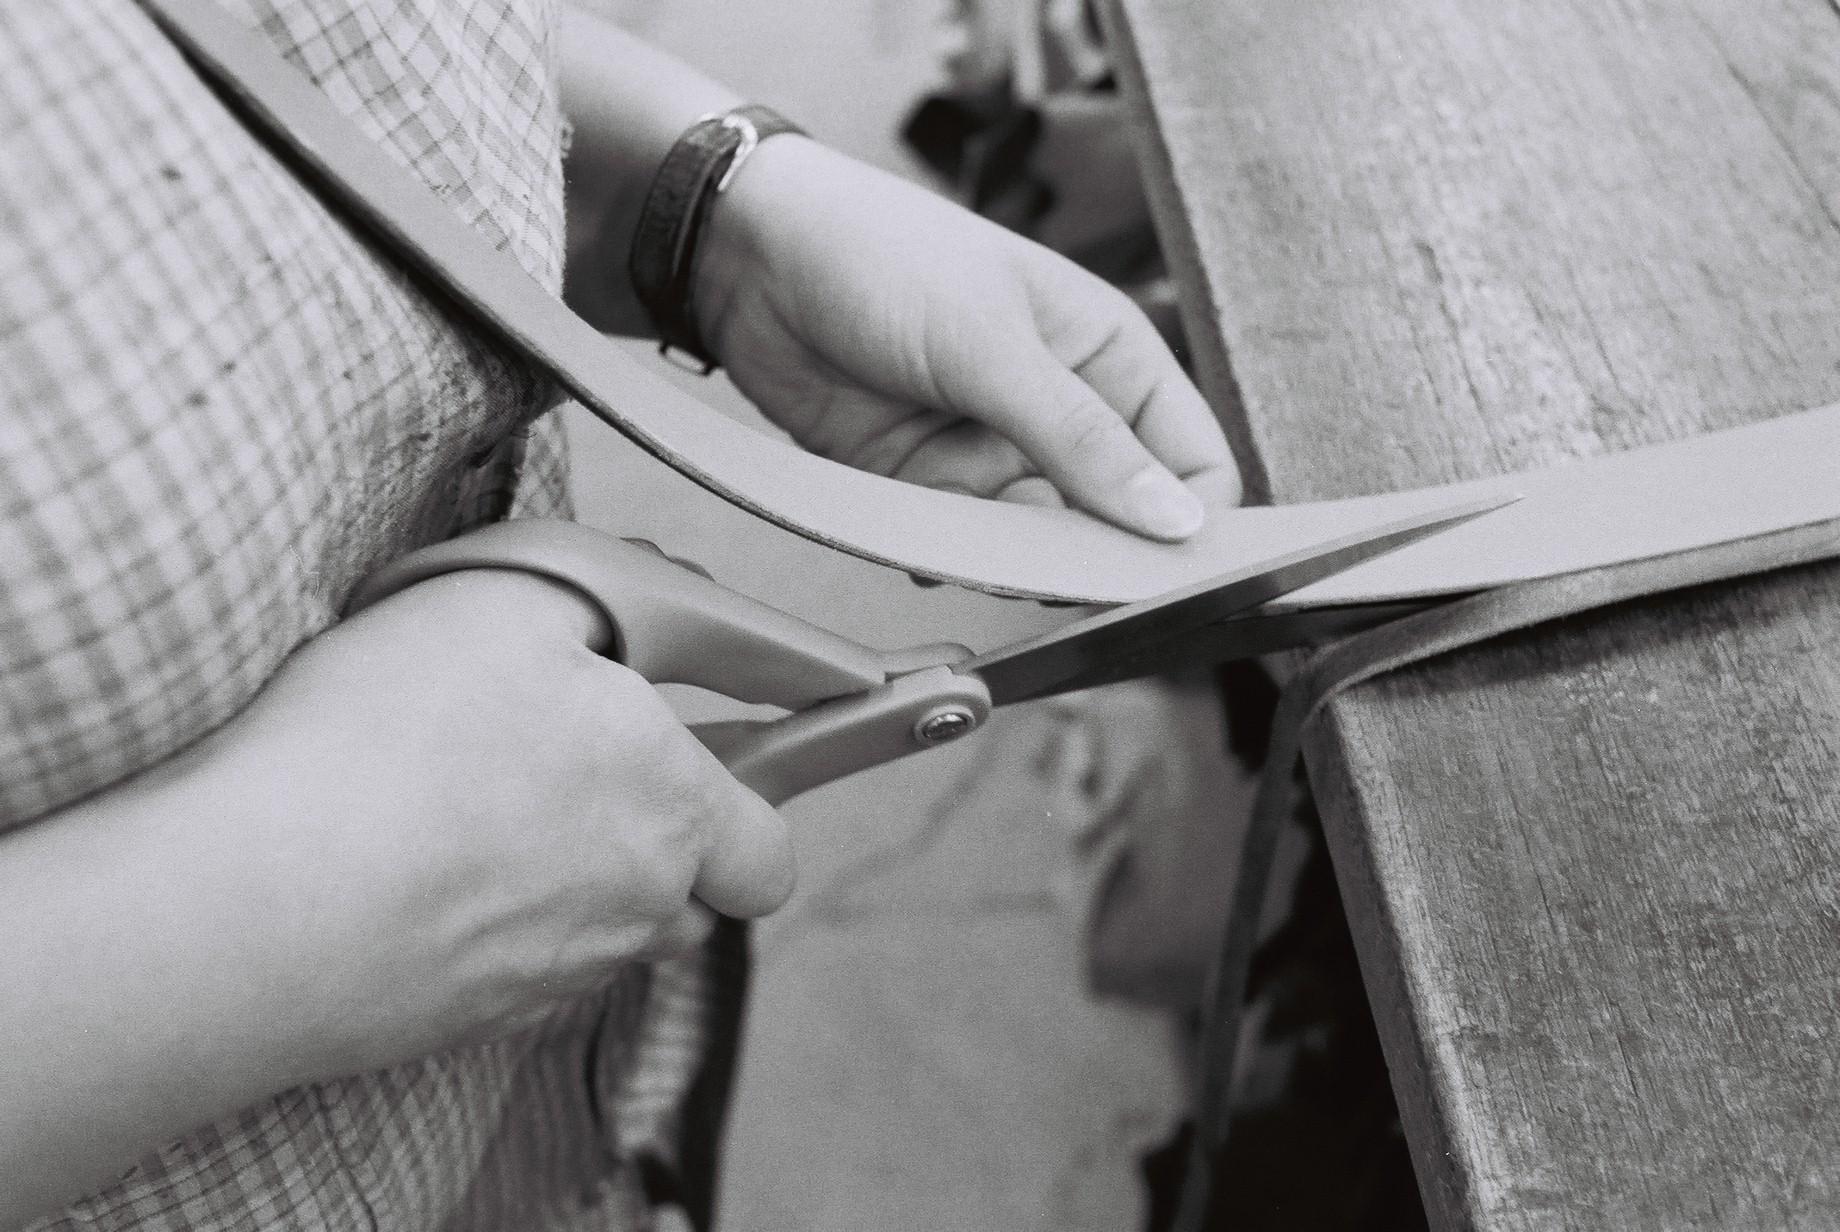 Artling_Ceinture sur mesure_Processus de fabrication_2